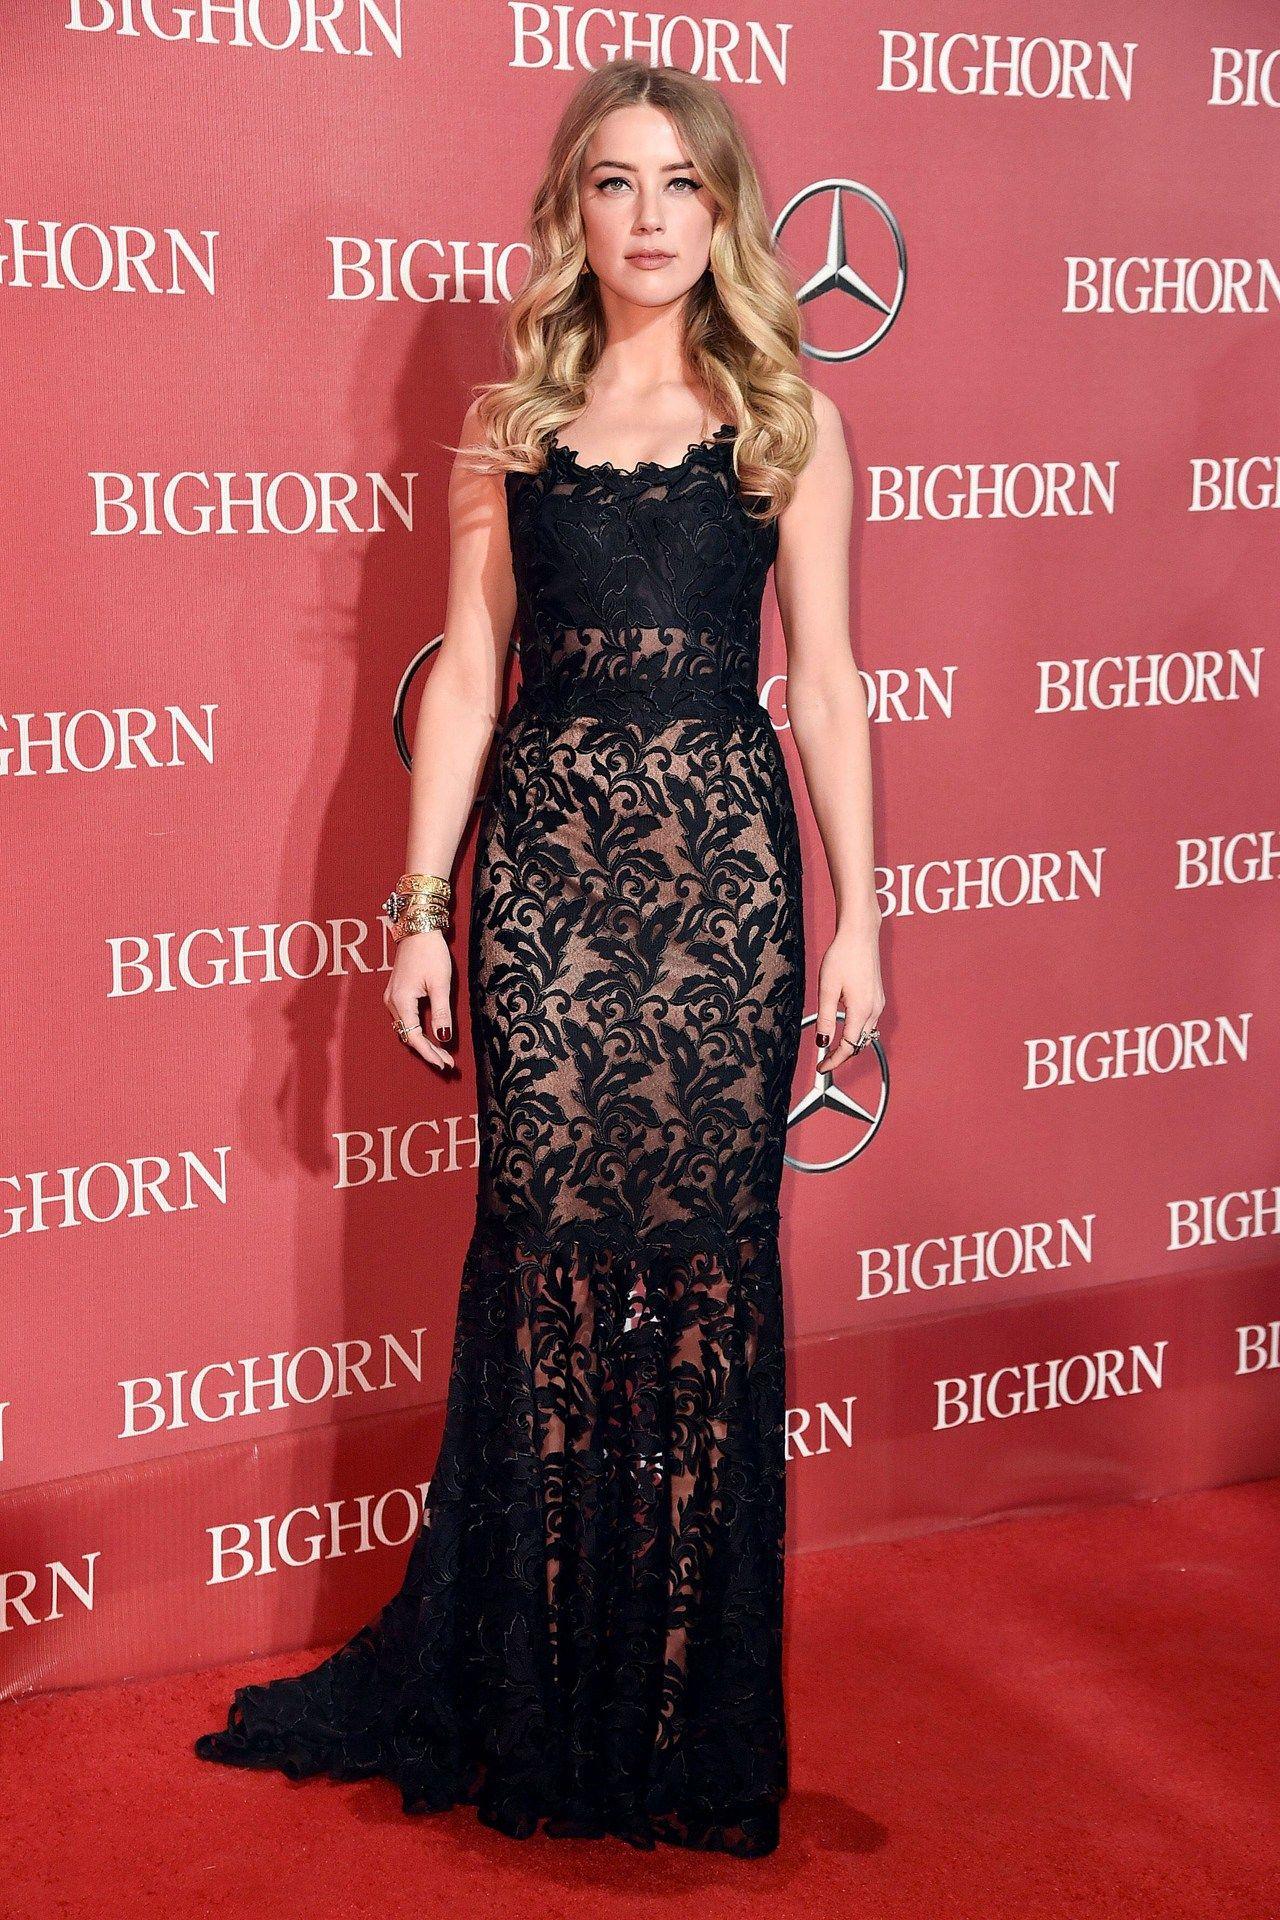 Palm Springs Film Festival Gala: Amber Heard in a Dolce & Gabbana gown